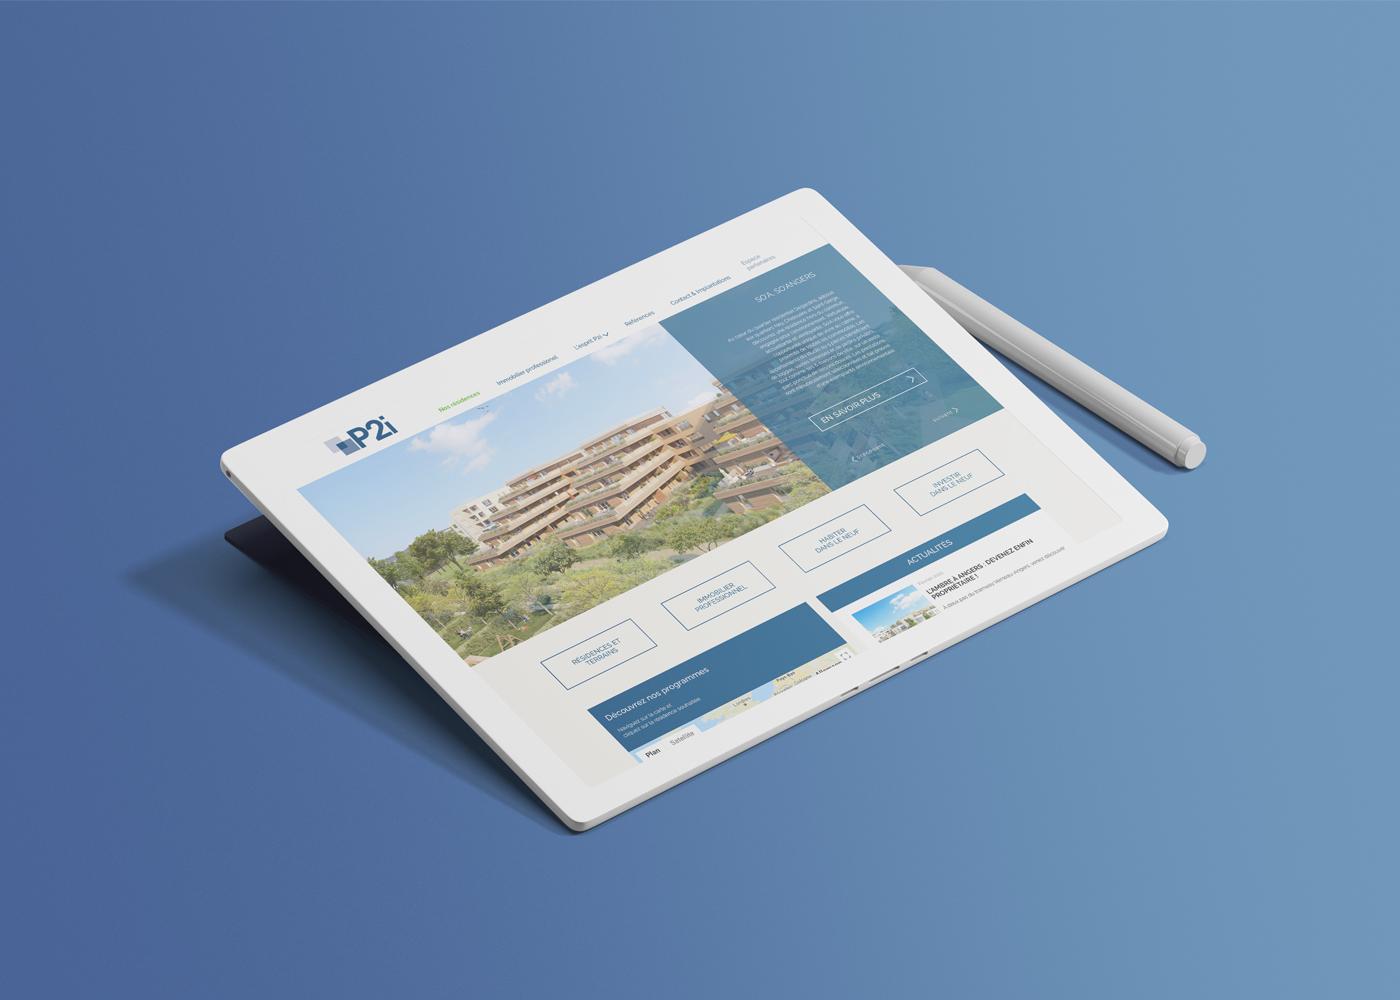 p2i iPad website